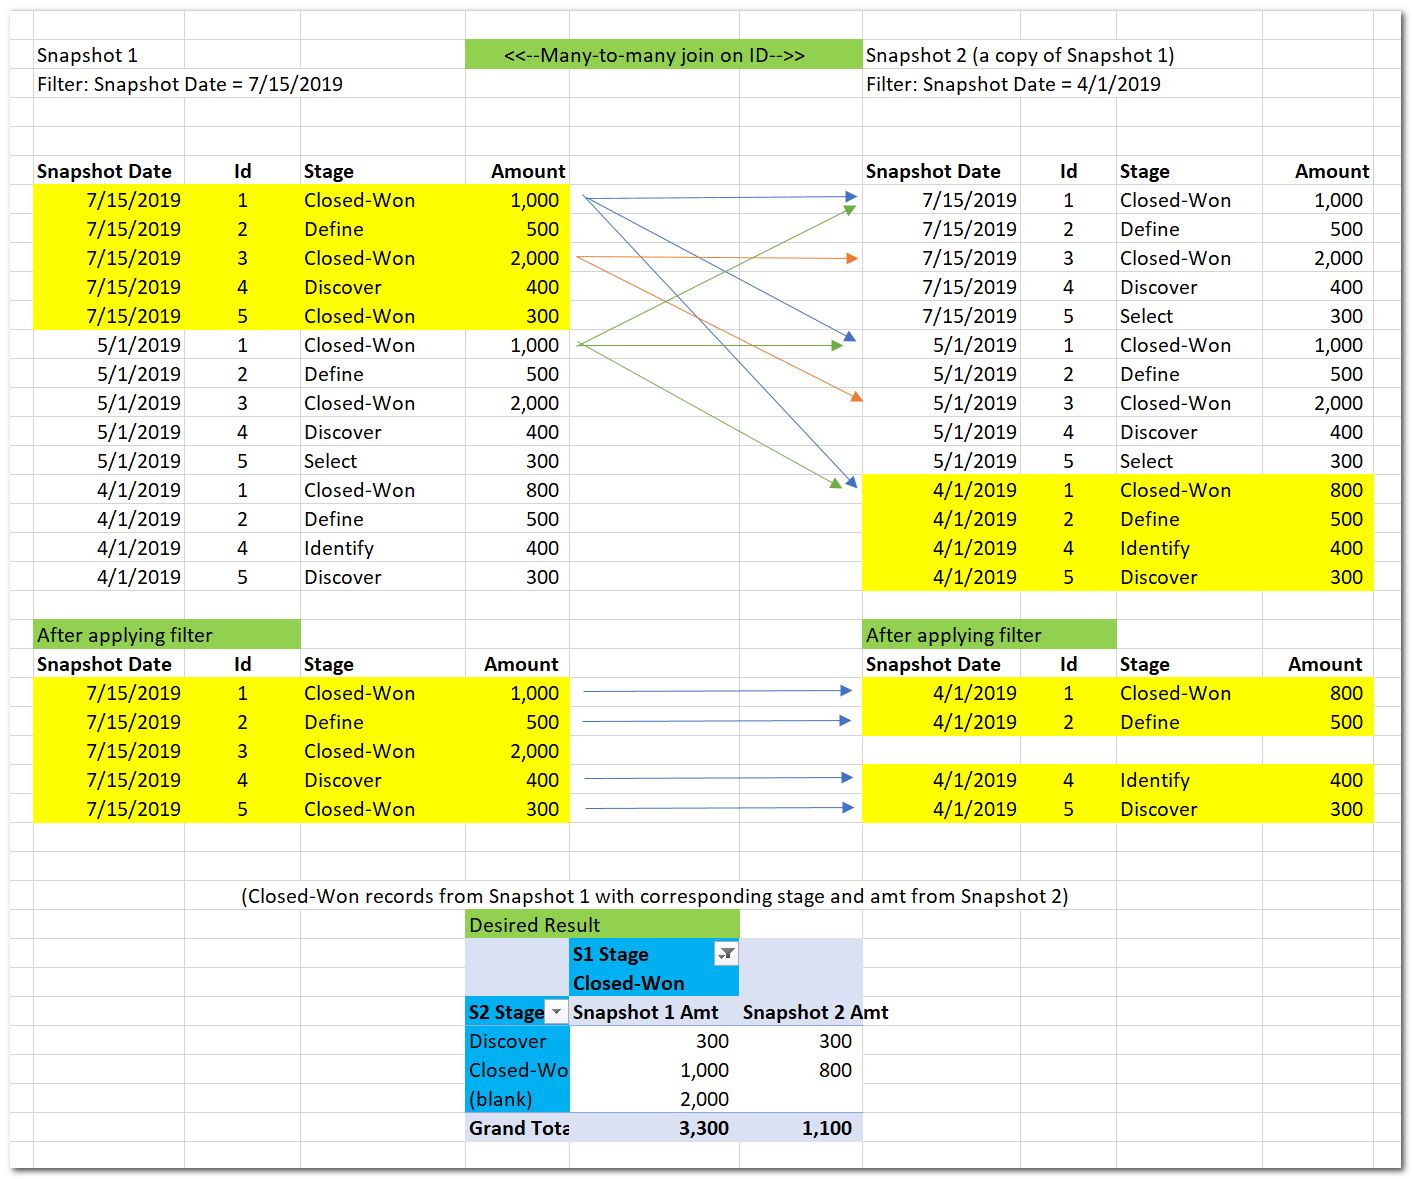 Need help with DAX, Salesforce (CRM) analysis - DAX